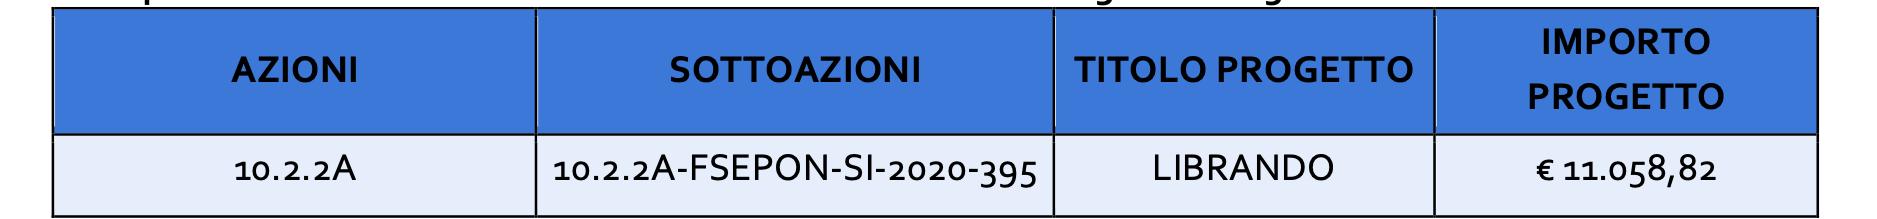 schermata2020-11-10-1605005909.png